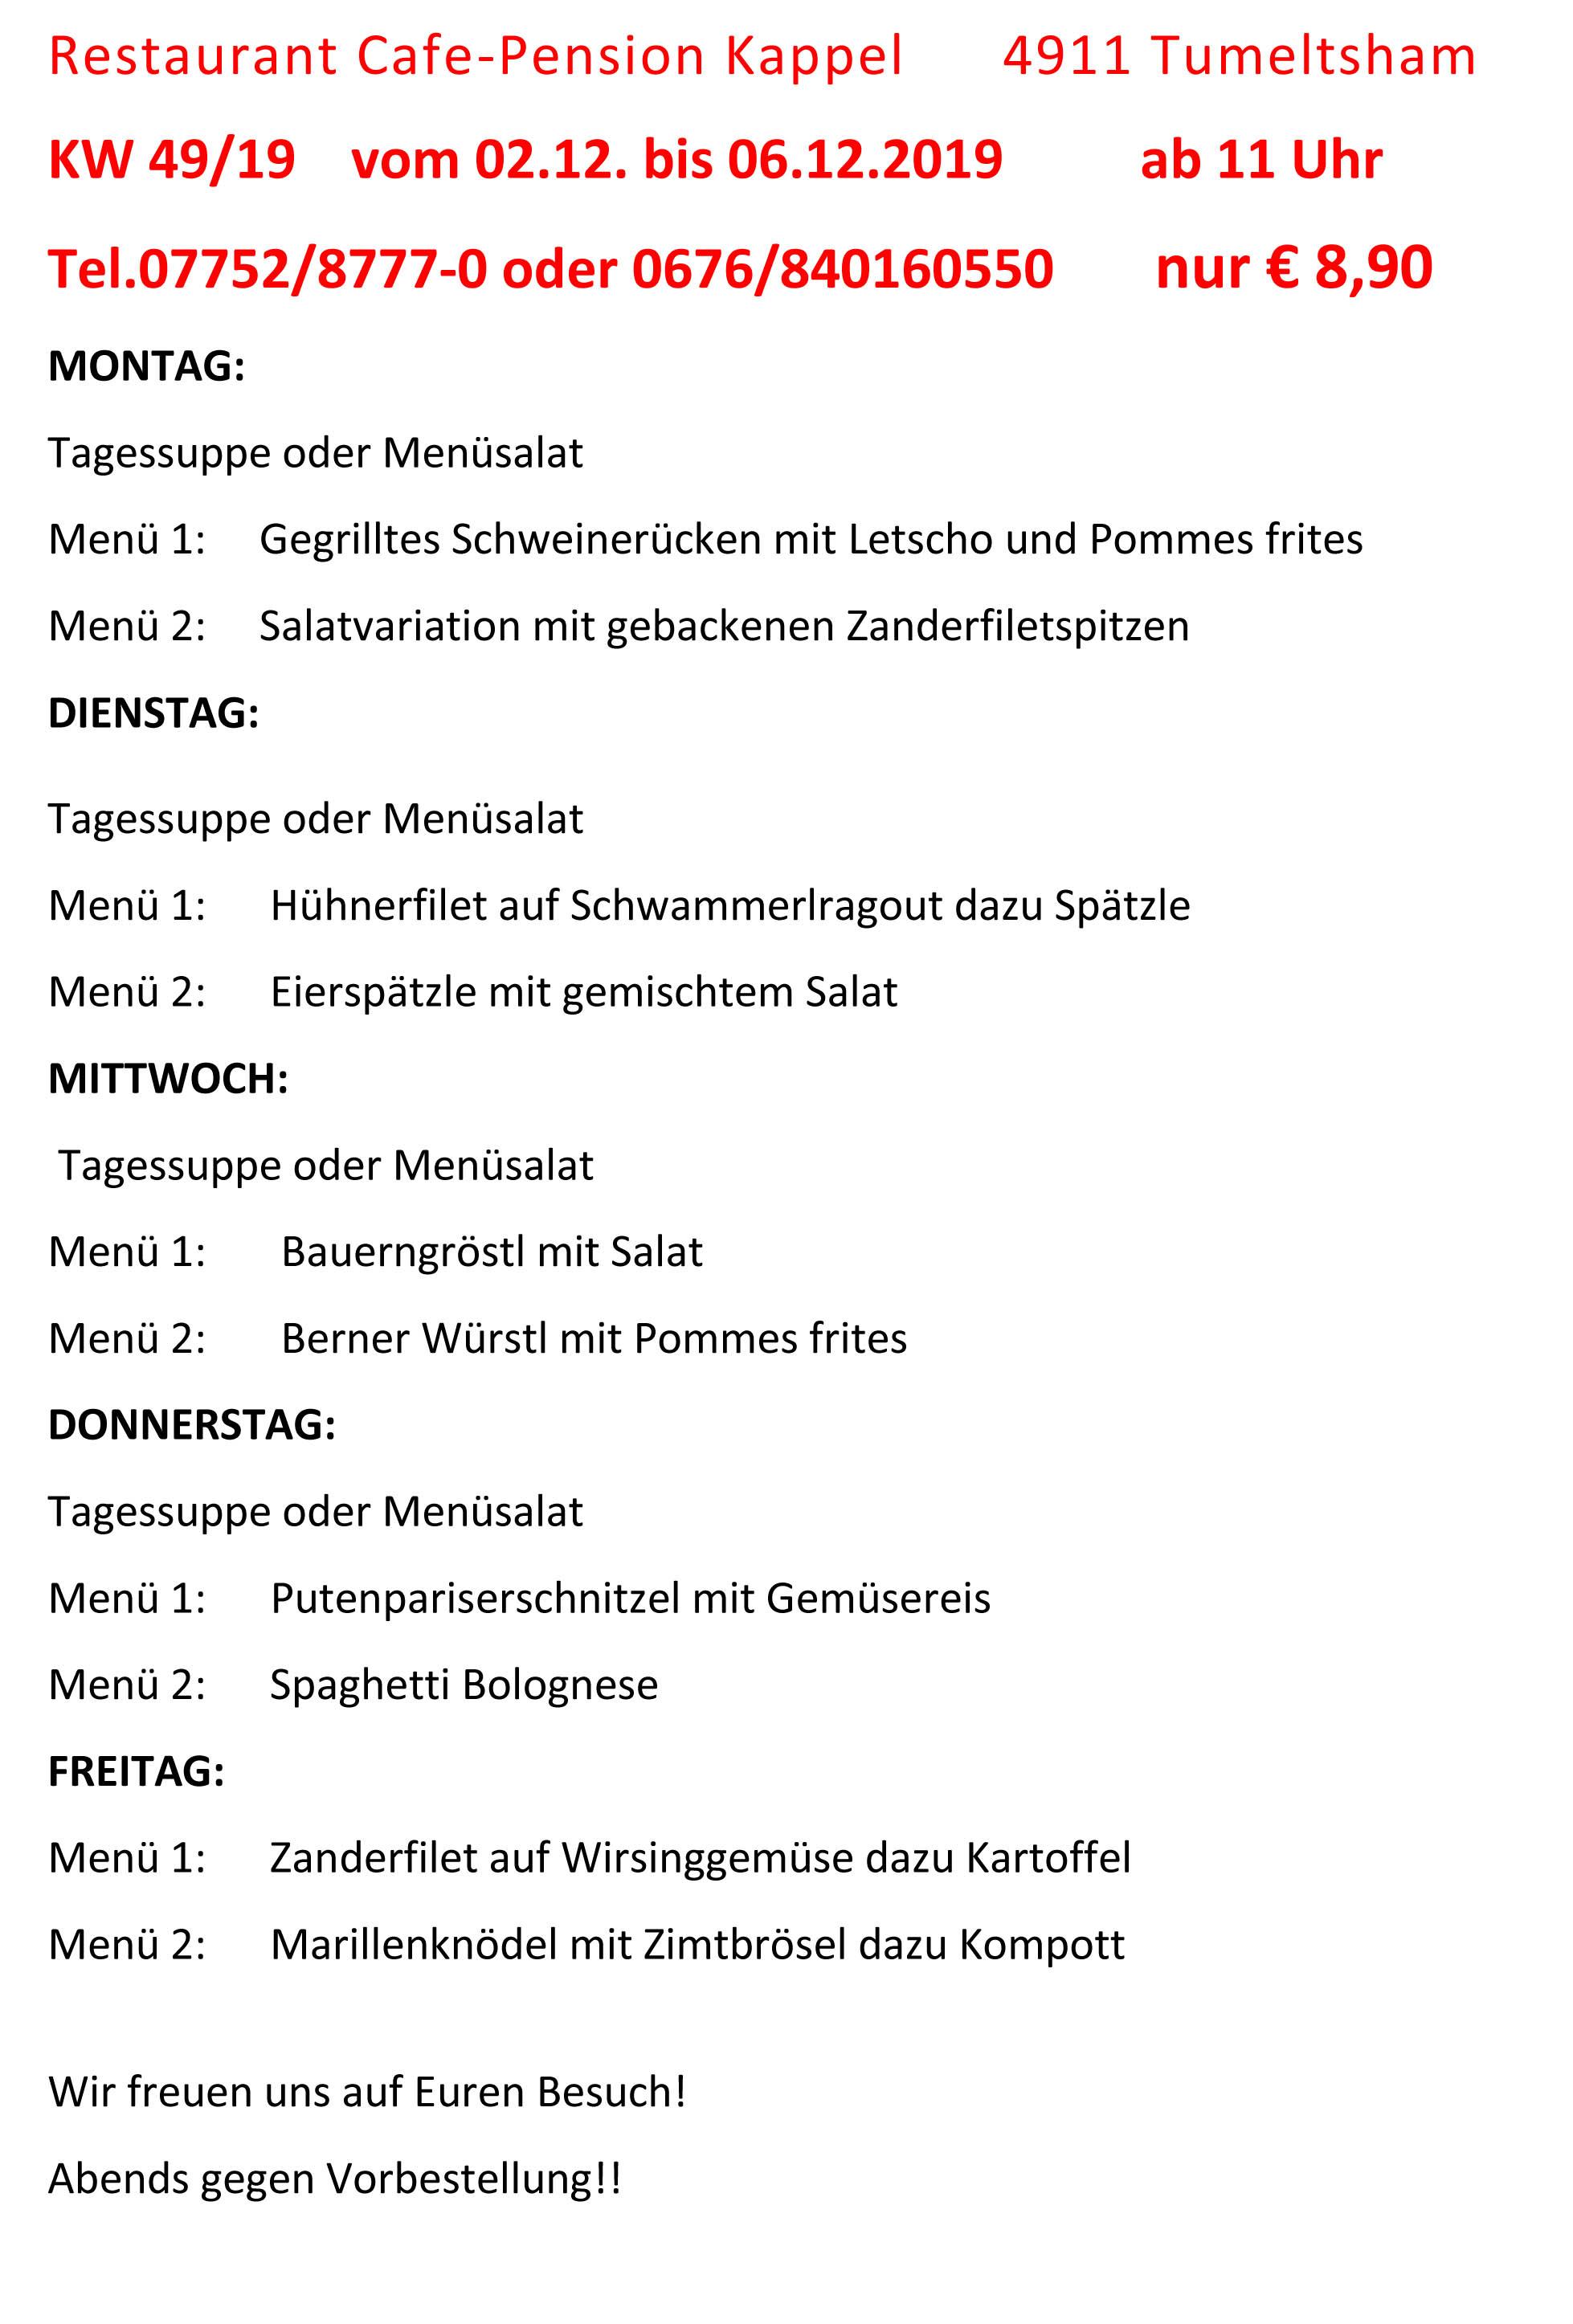 Menüplan KW 49-19 (1)